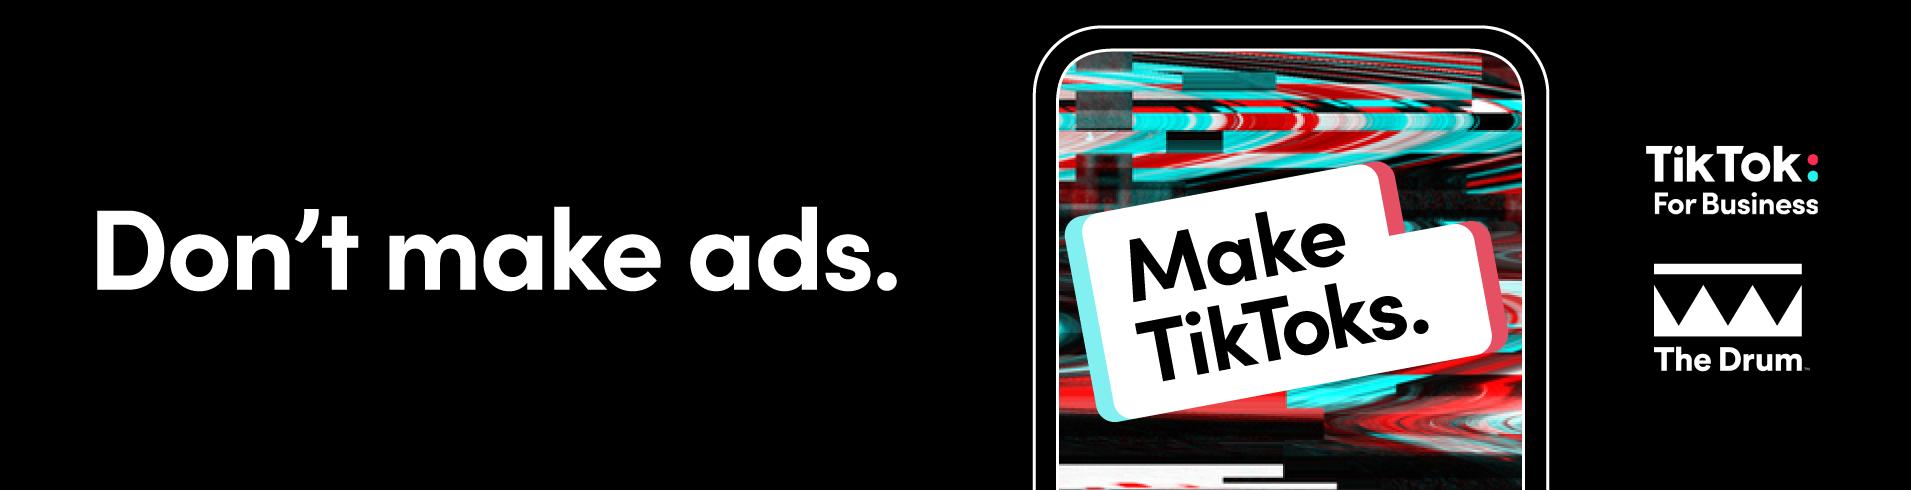 Don't make ads. Make TikToks